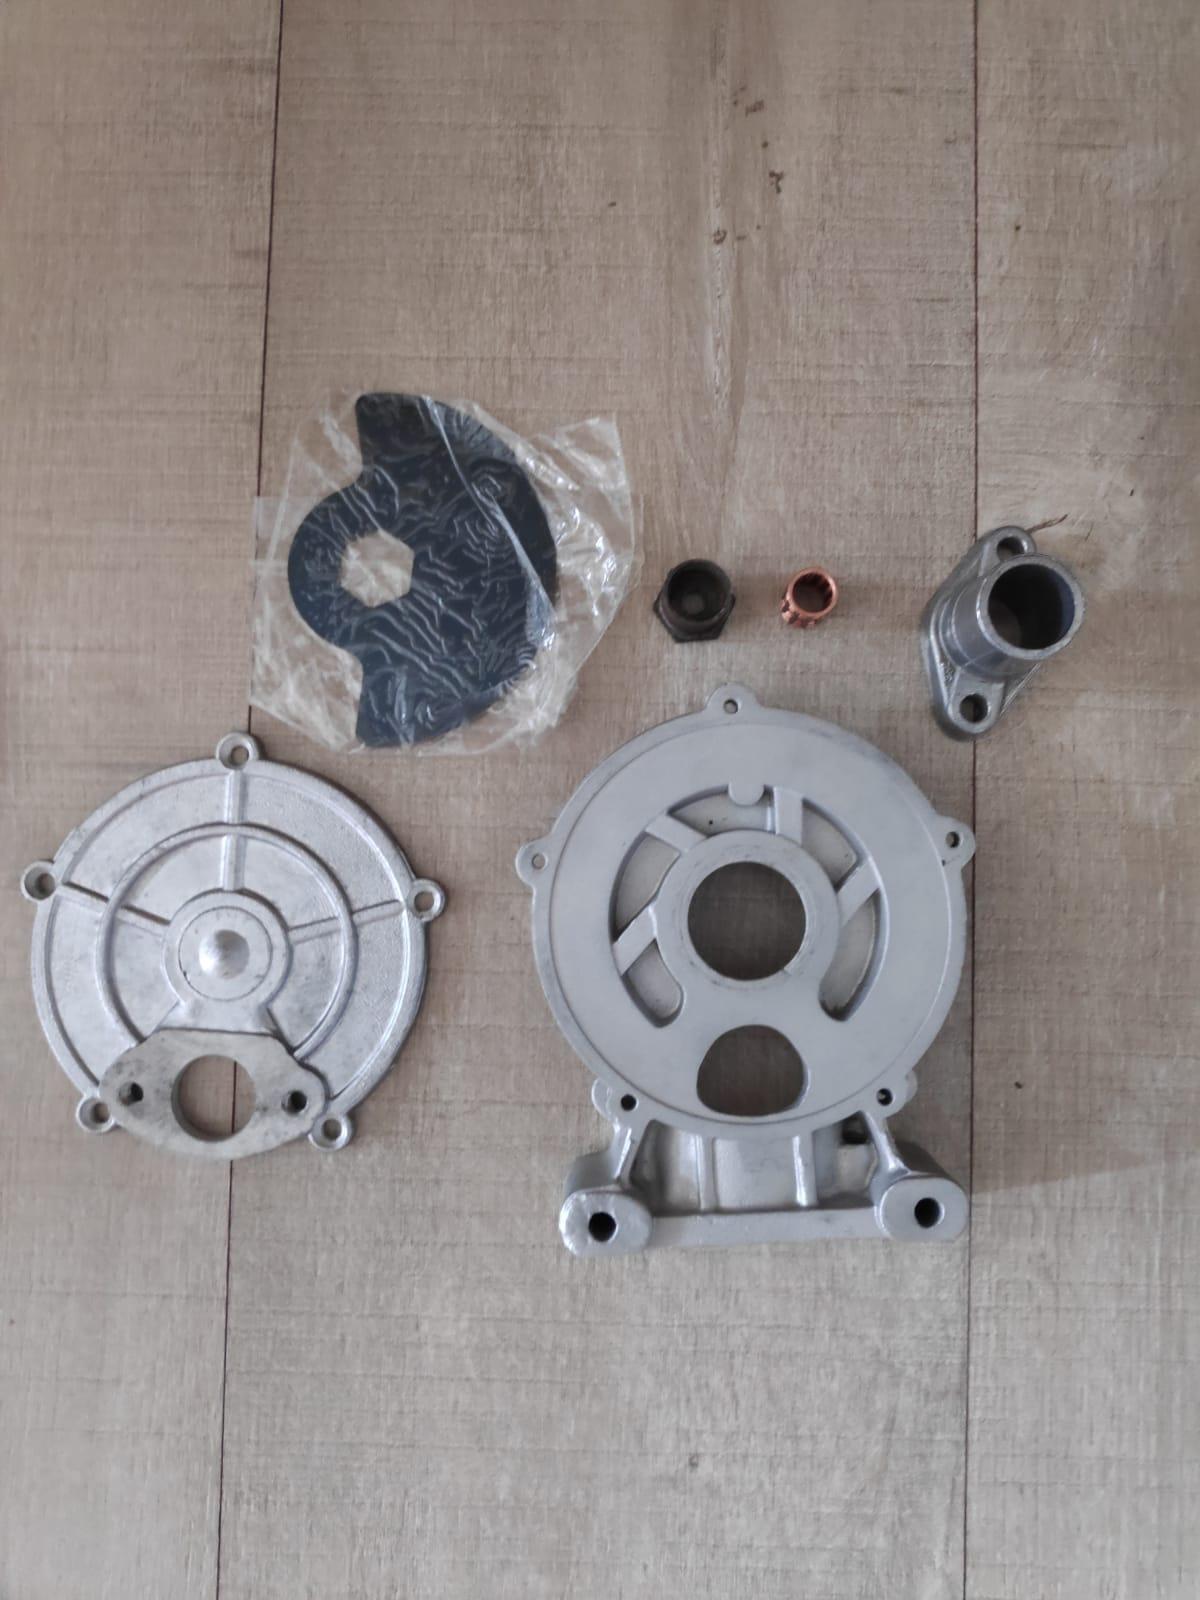 EC16C03C-BFF9-4343-8E5D-DF4E54C41D0C